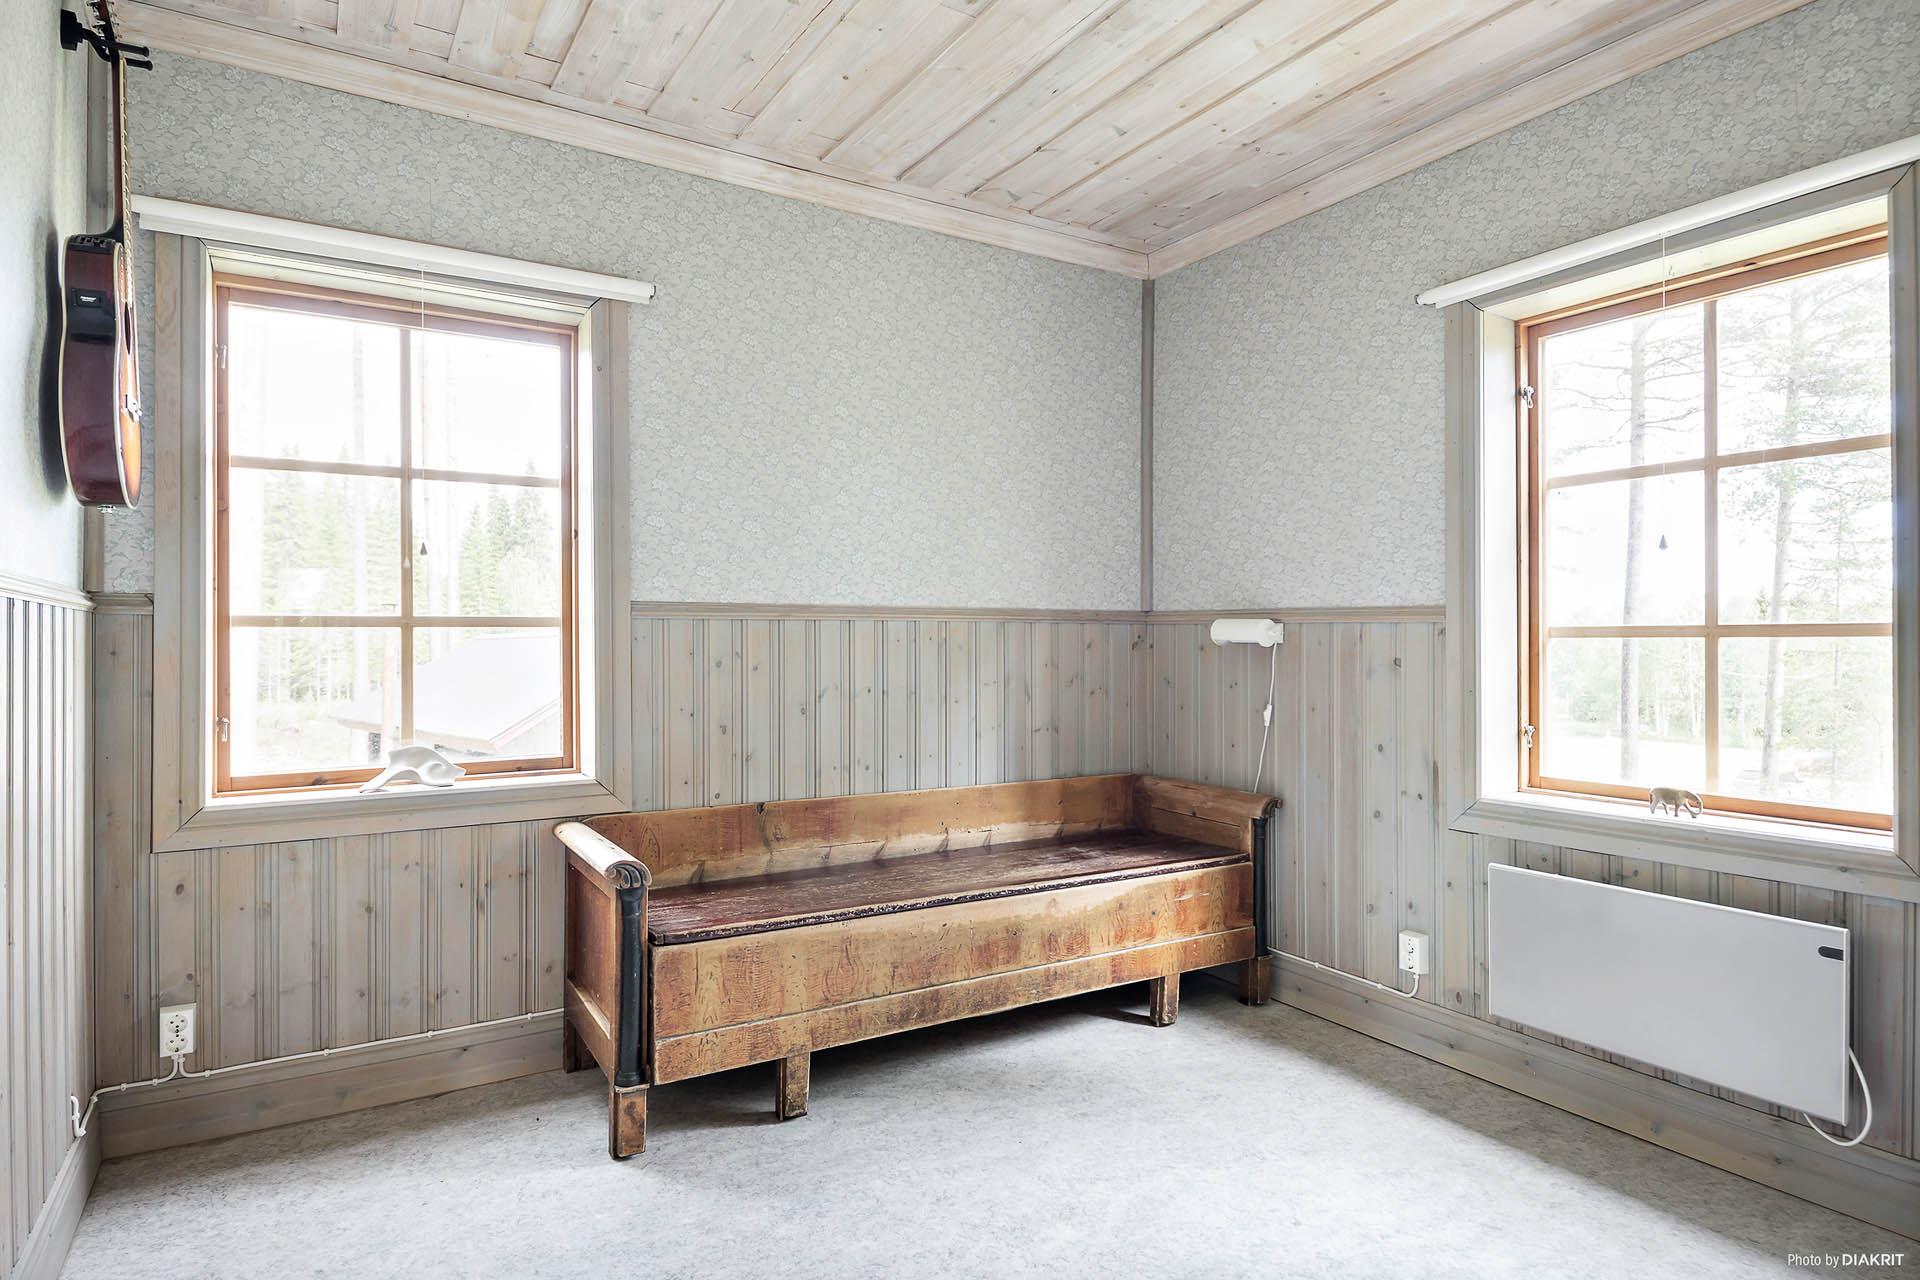 Sovrummet i kvarnstugan